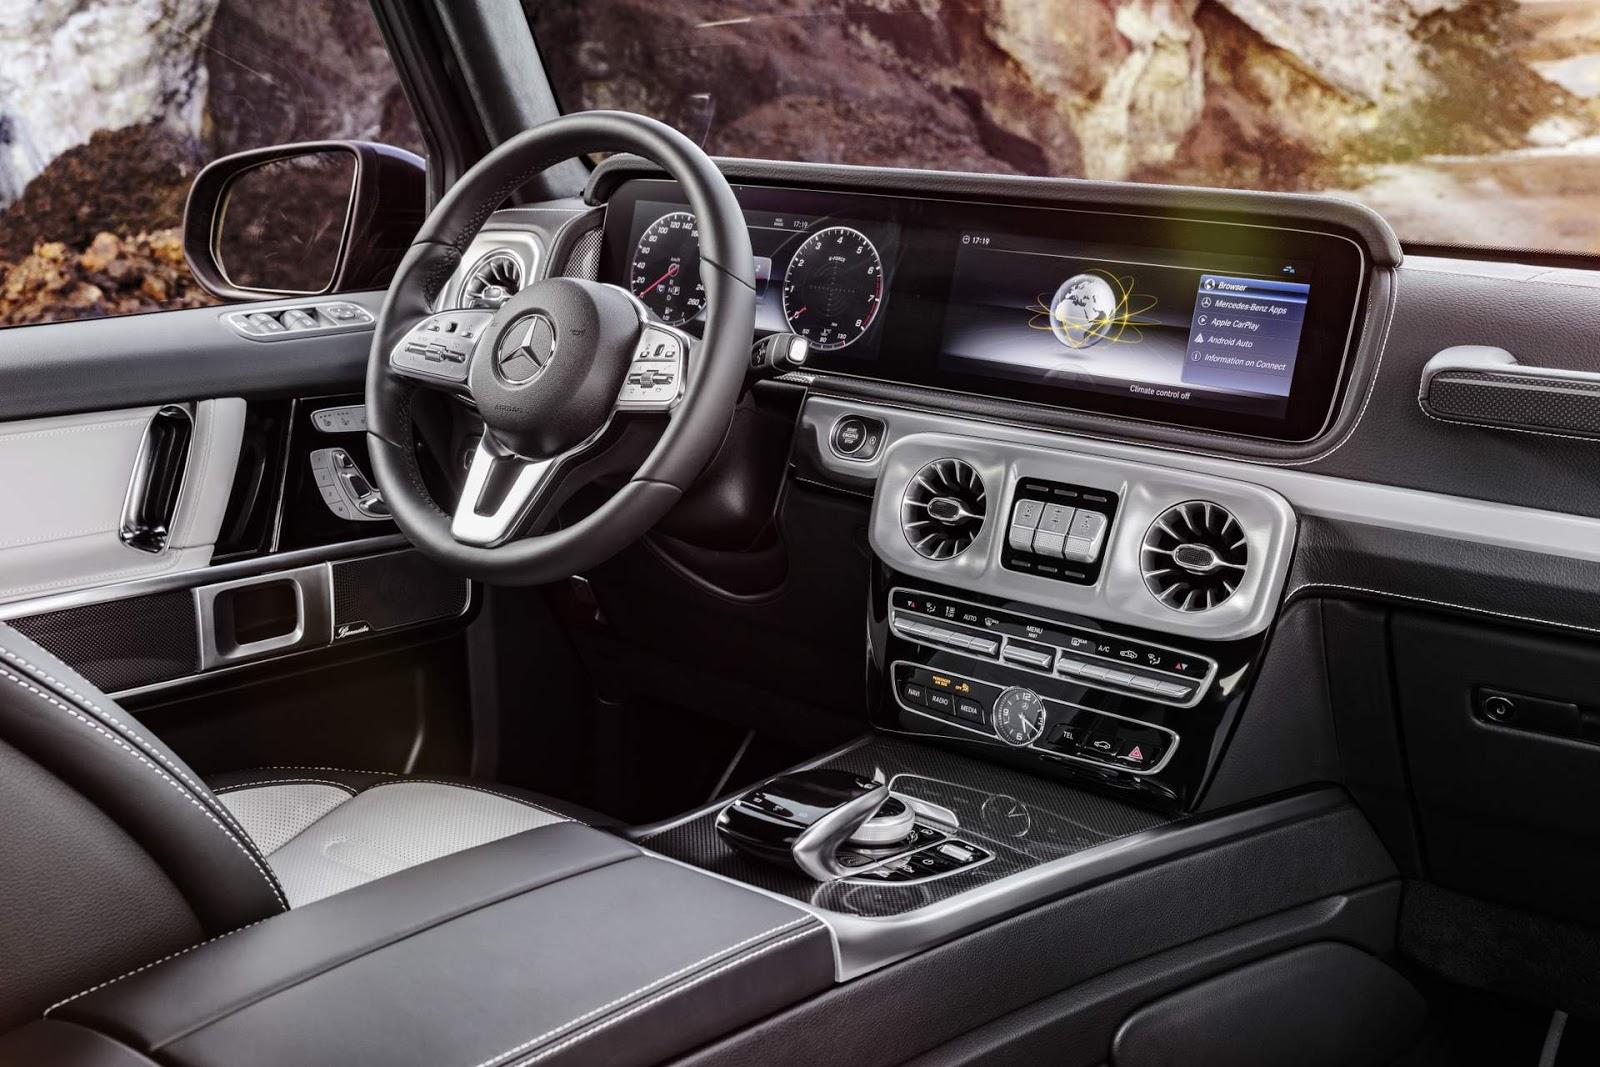 Mercedes-Benz Classe G 2019